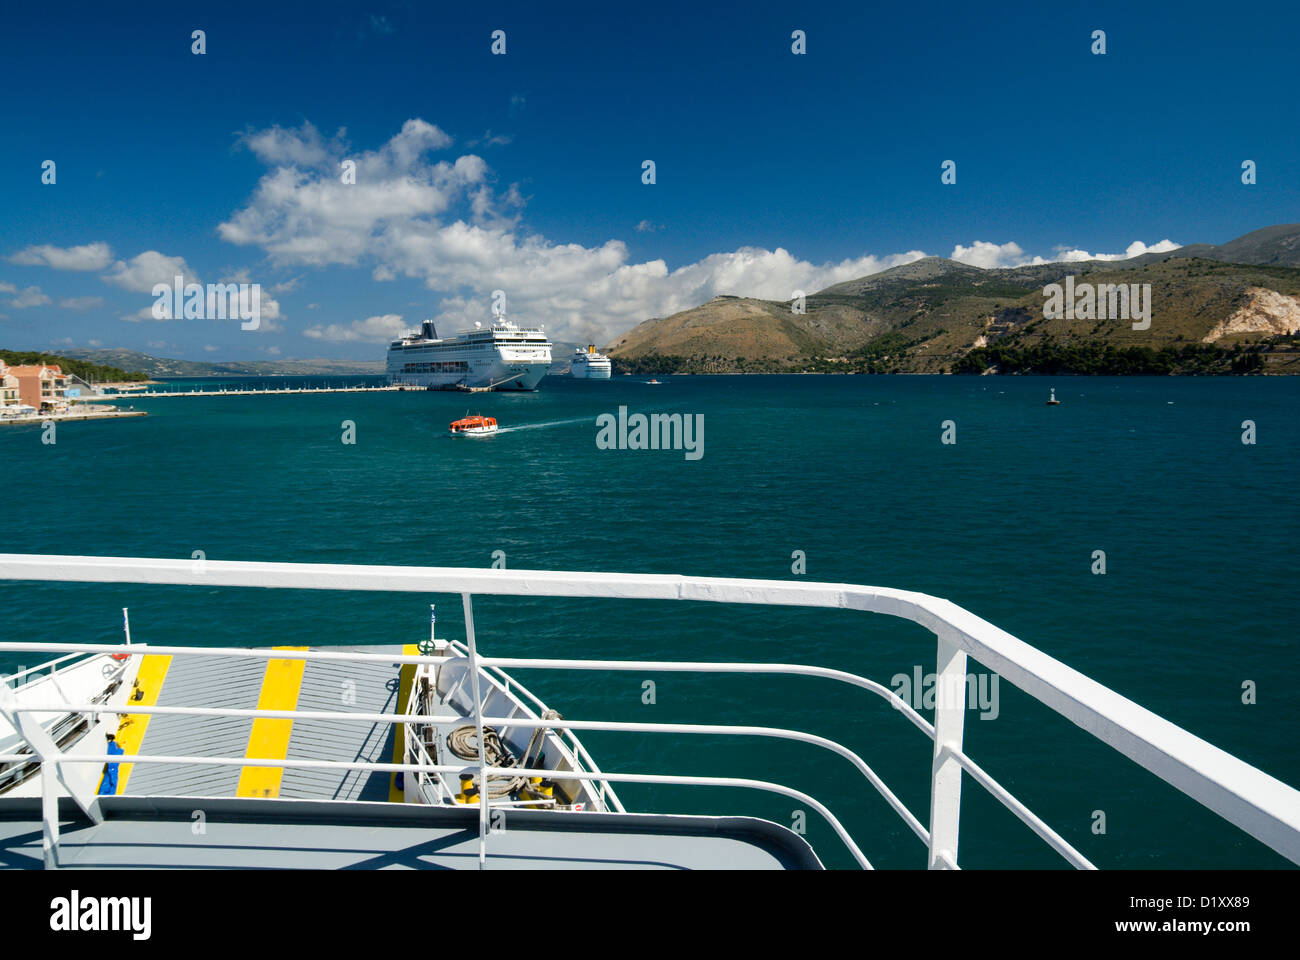 Cruise ship MSC Armonia moored in Argostoli Bay, taken from the lixouri ferry Arostoli, Kefalonia, Ionian Islands, - Stock Image